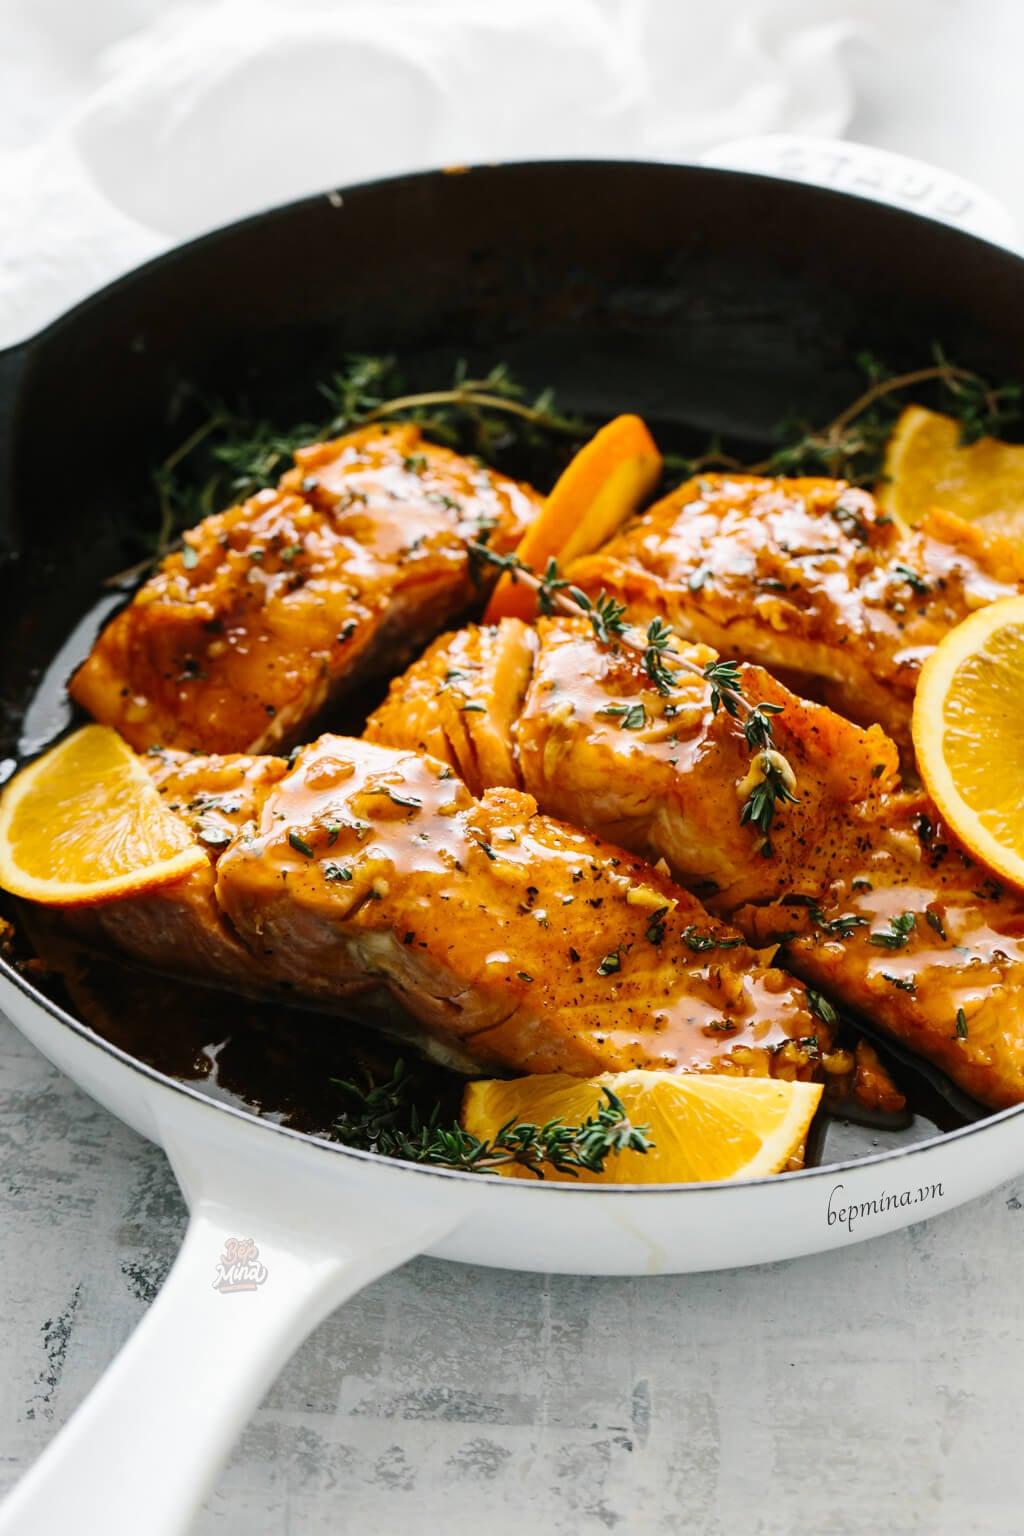 cách làm cá hồi sốt cam